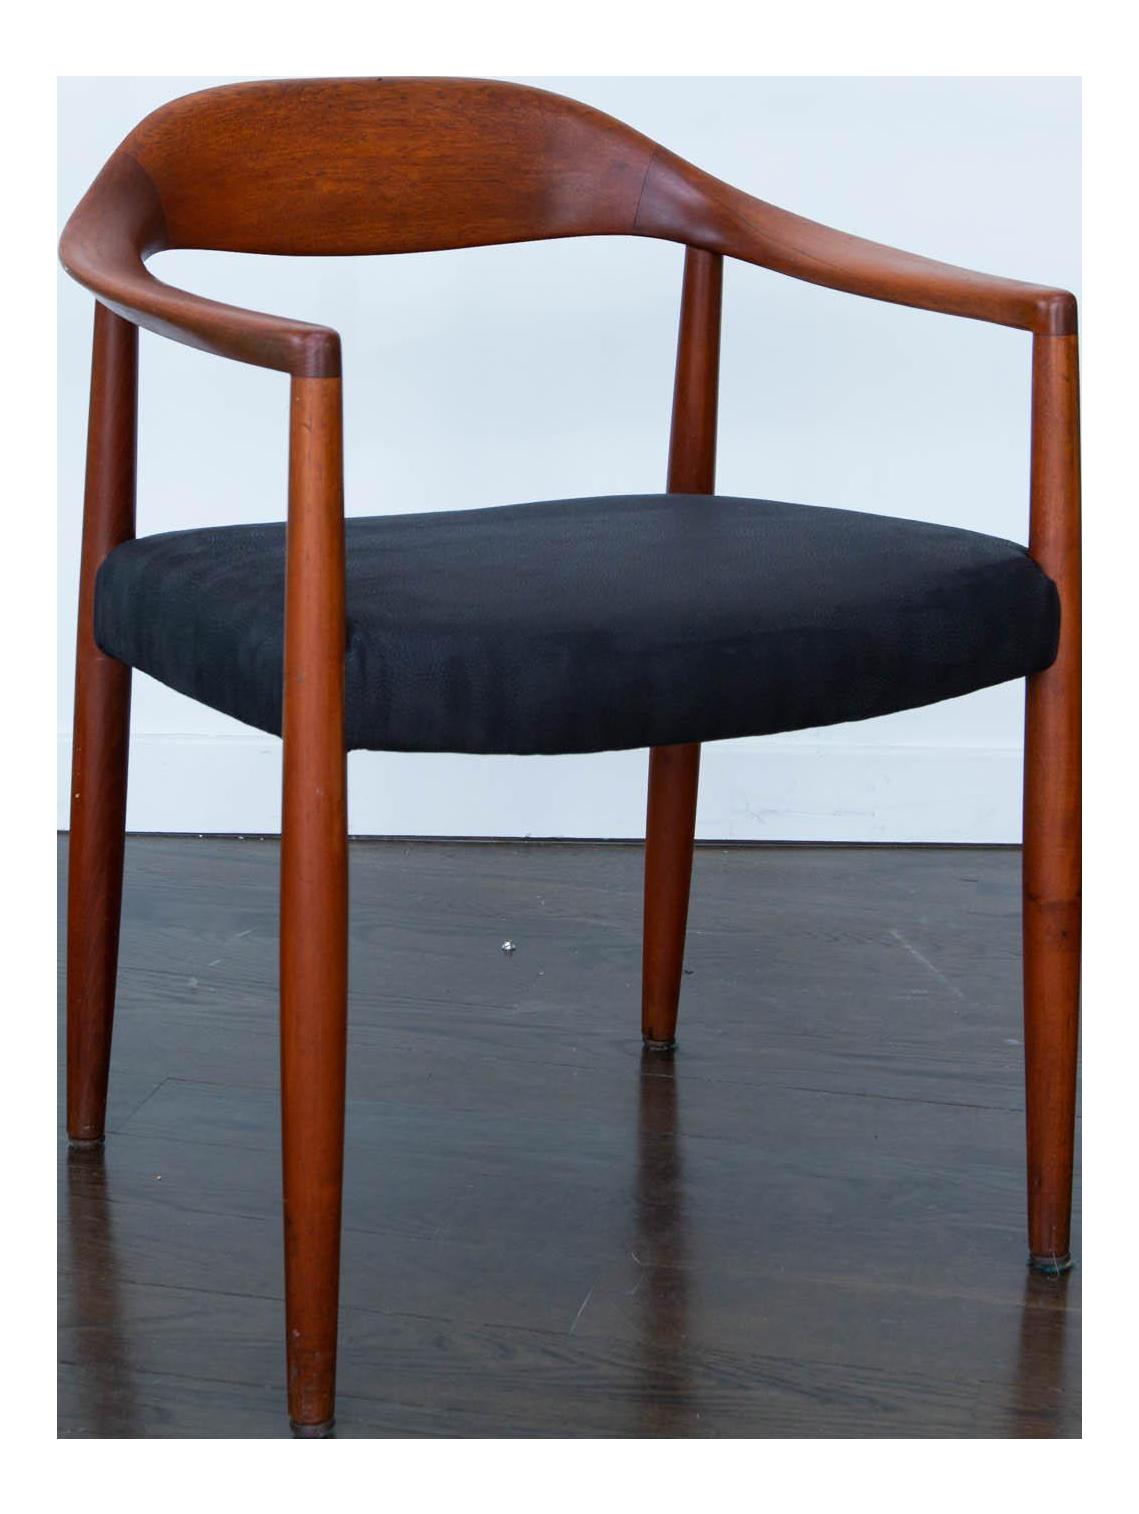 Nice Hans Wegner Round Chair #8 - Hans Wegner Round Chair Style Teak Armchair - Image 1 Of 7